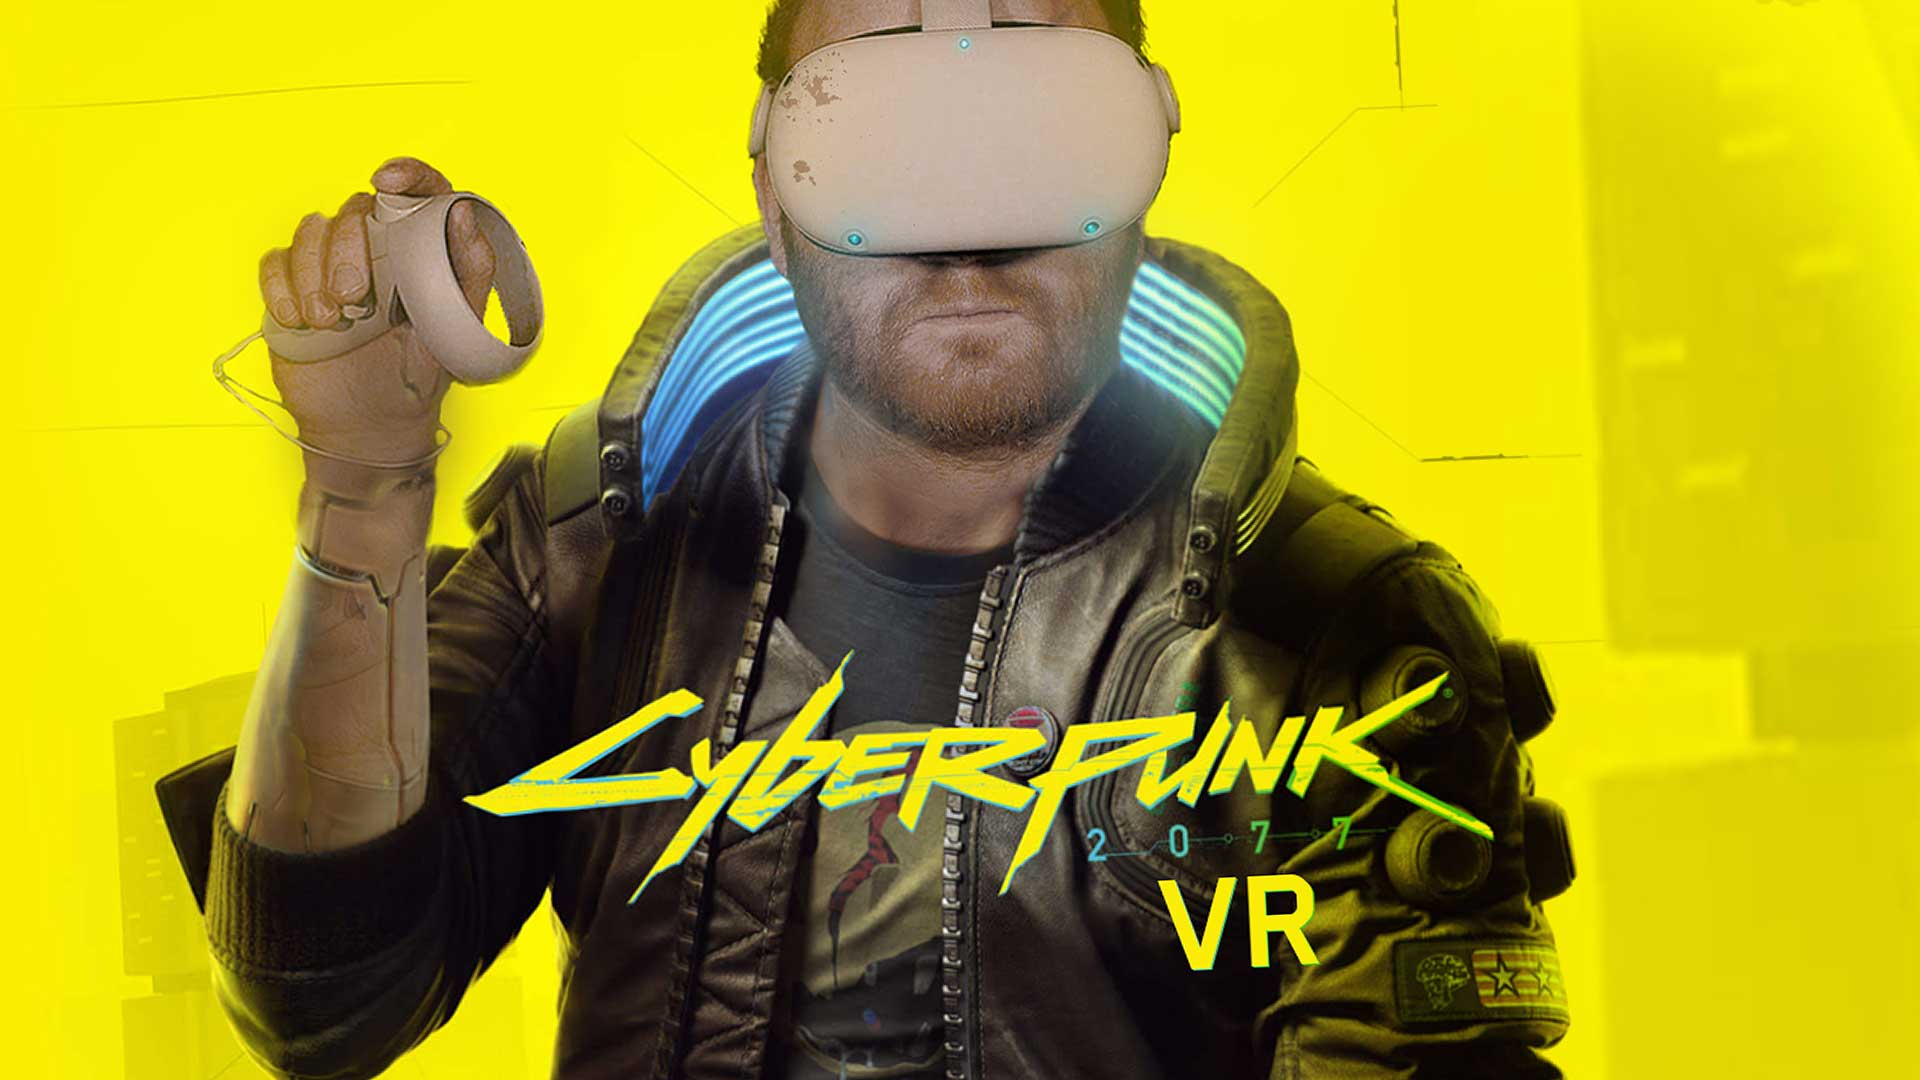 cyberpunk 2077 vr mode